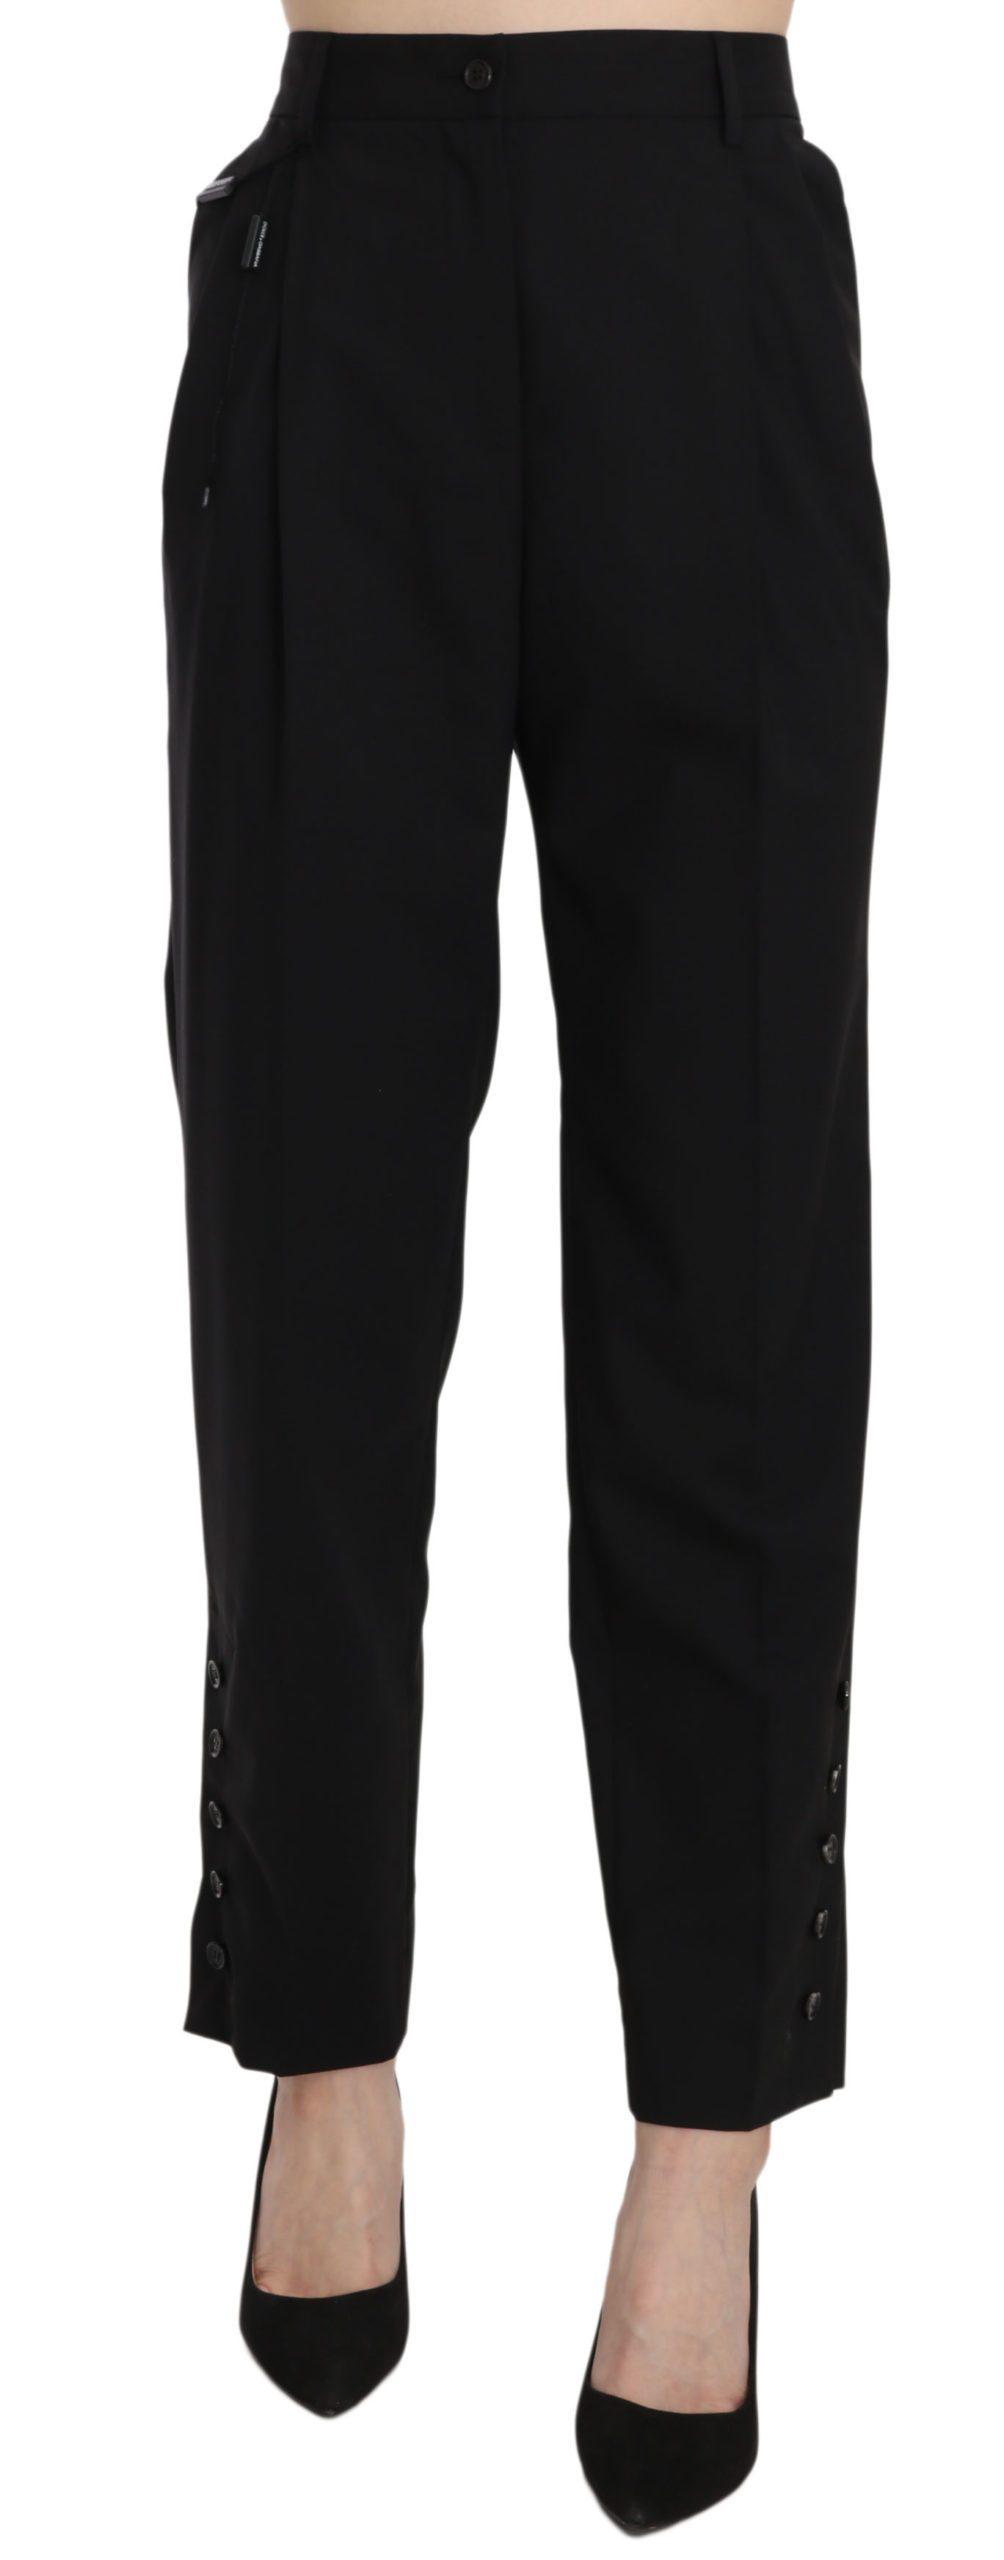 Dolce & Gabbana Women's Wool Stretch High Waist Pleated Trouser Black PAN61334 - IT42|M